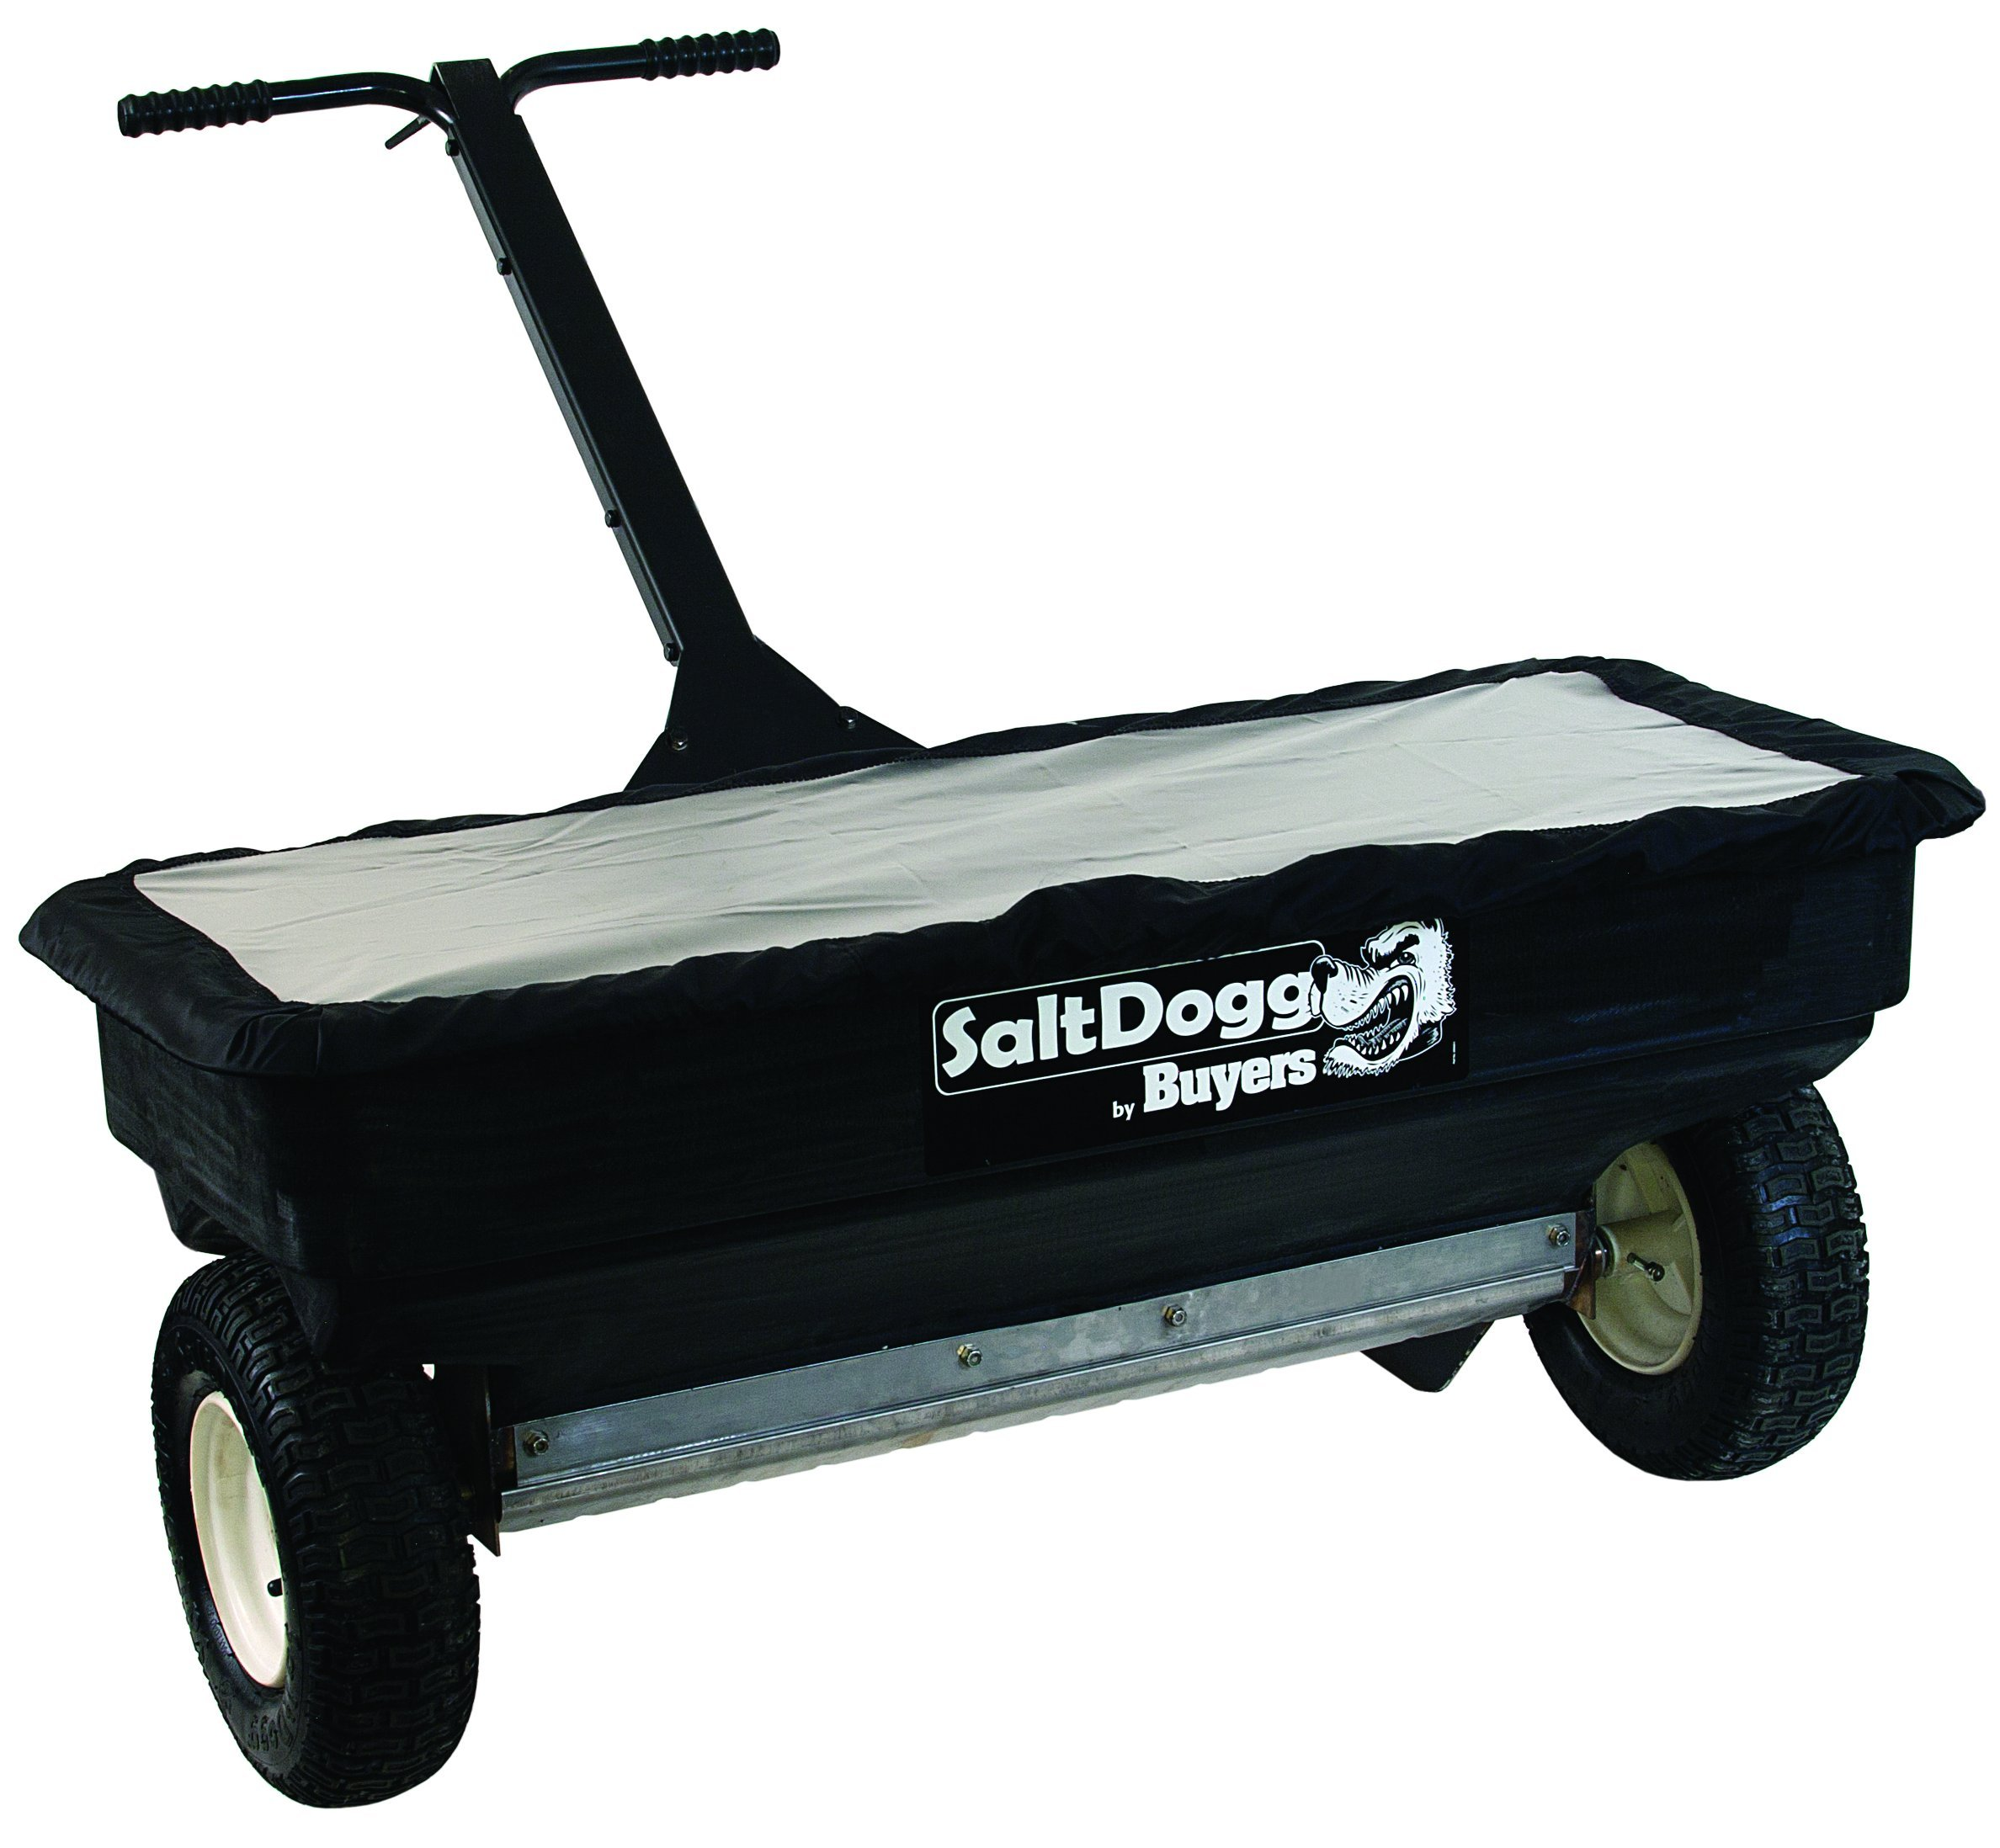 SaltDogg WB400 Professional 200 lb Capacity Walk Behind Drop Salt Spreader